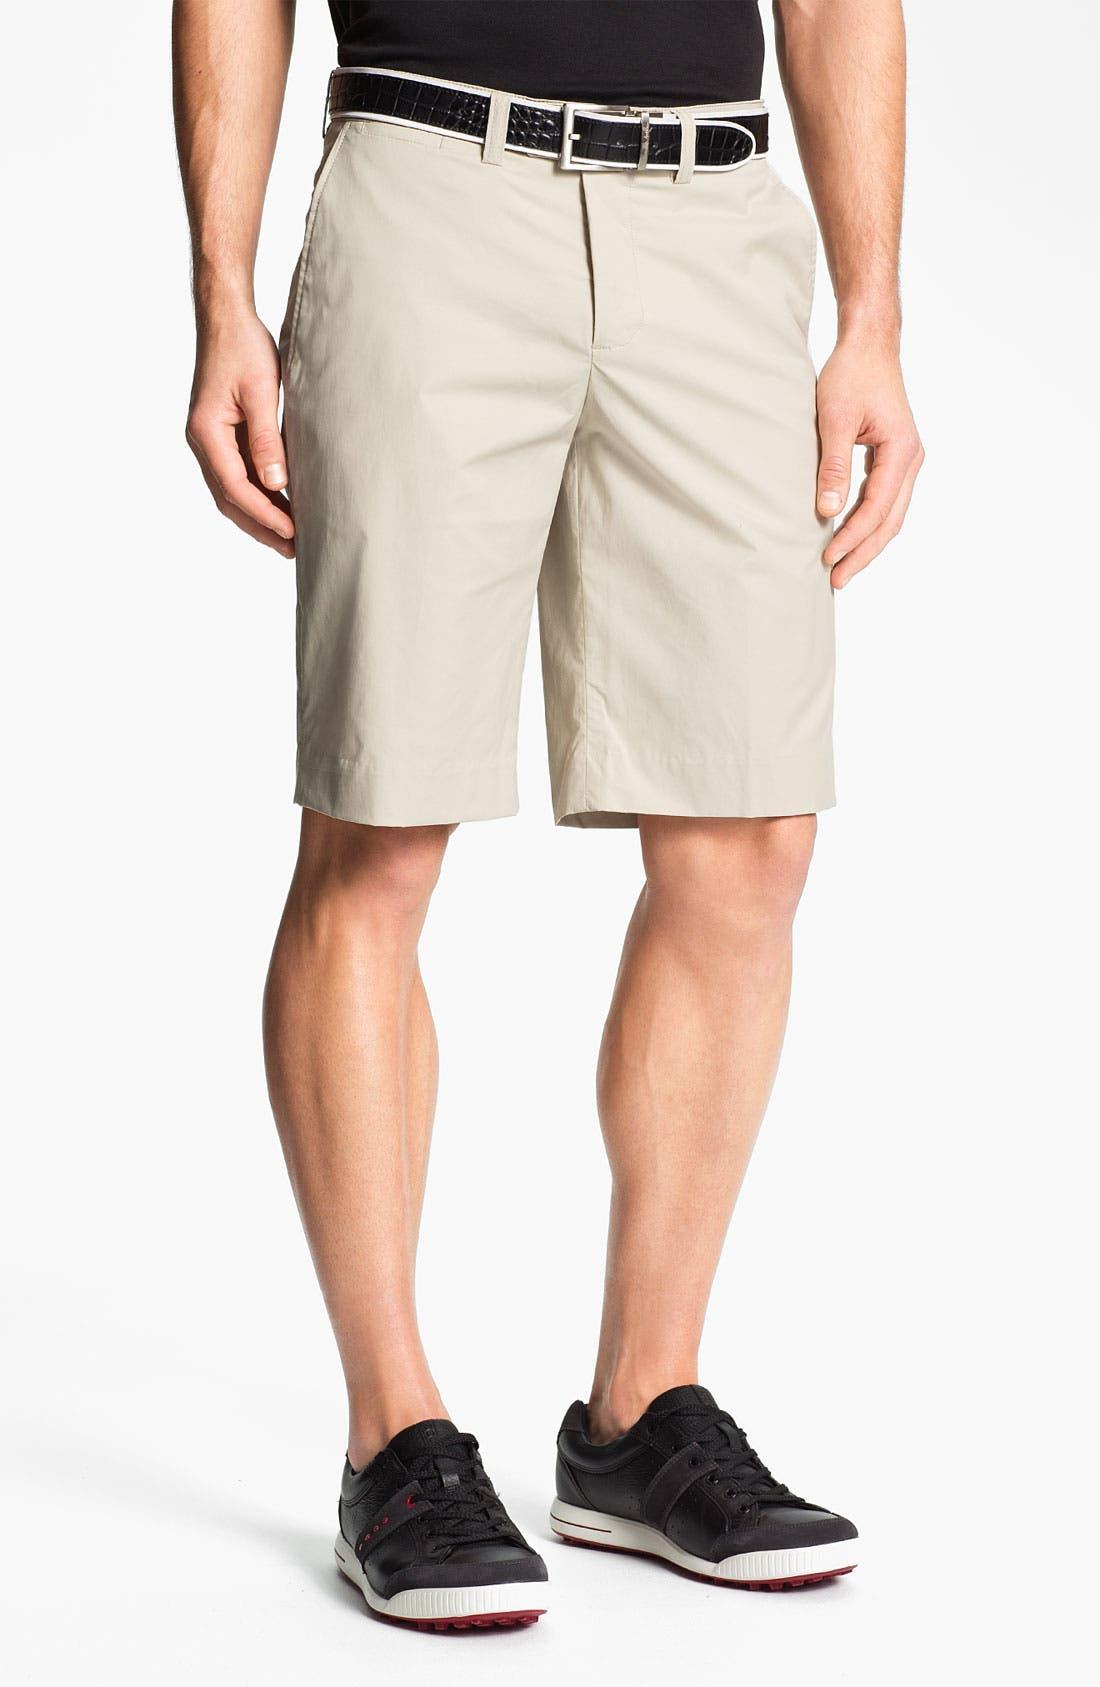 Alternate Image 1 Selected - Aquascutum Golf 'Mash' Golf Shorts (Online Only)